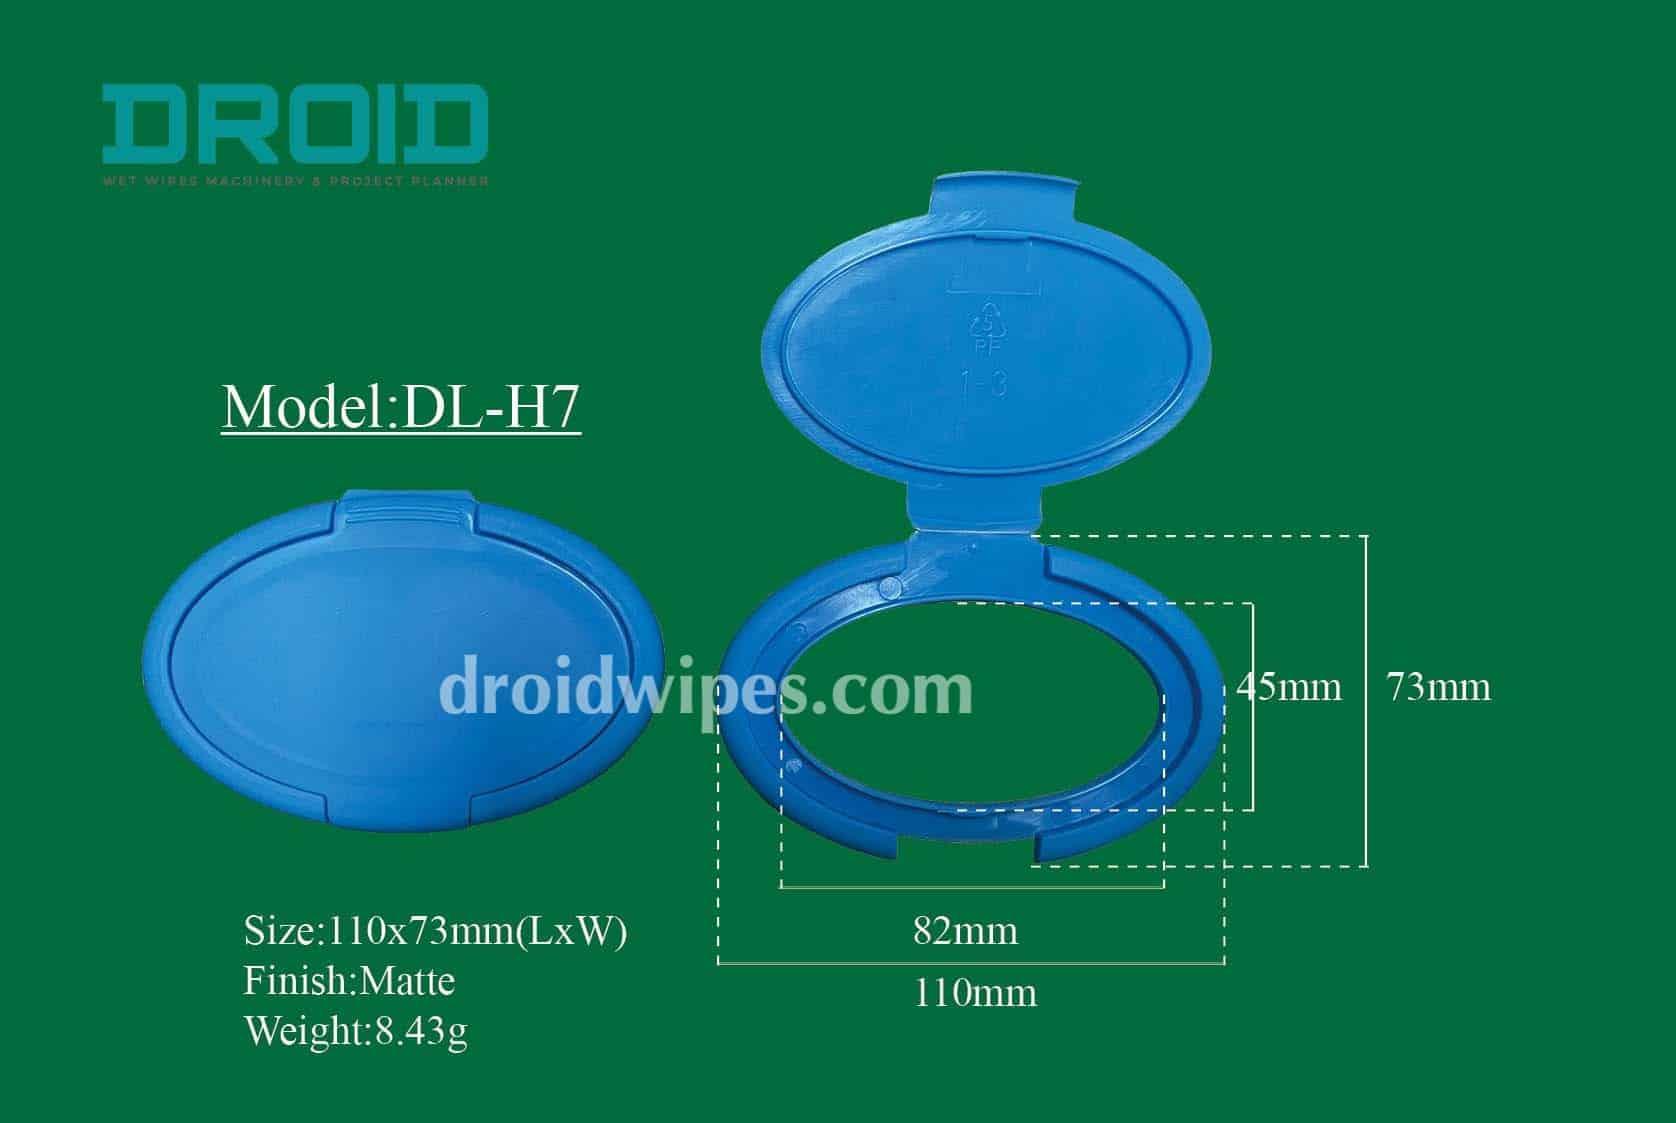 Plastic lid for wet wipes 6 - Plastic Lid for Wet Wipes